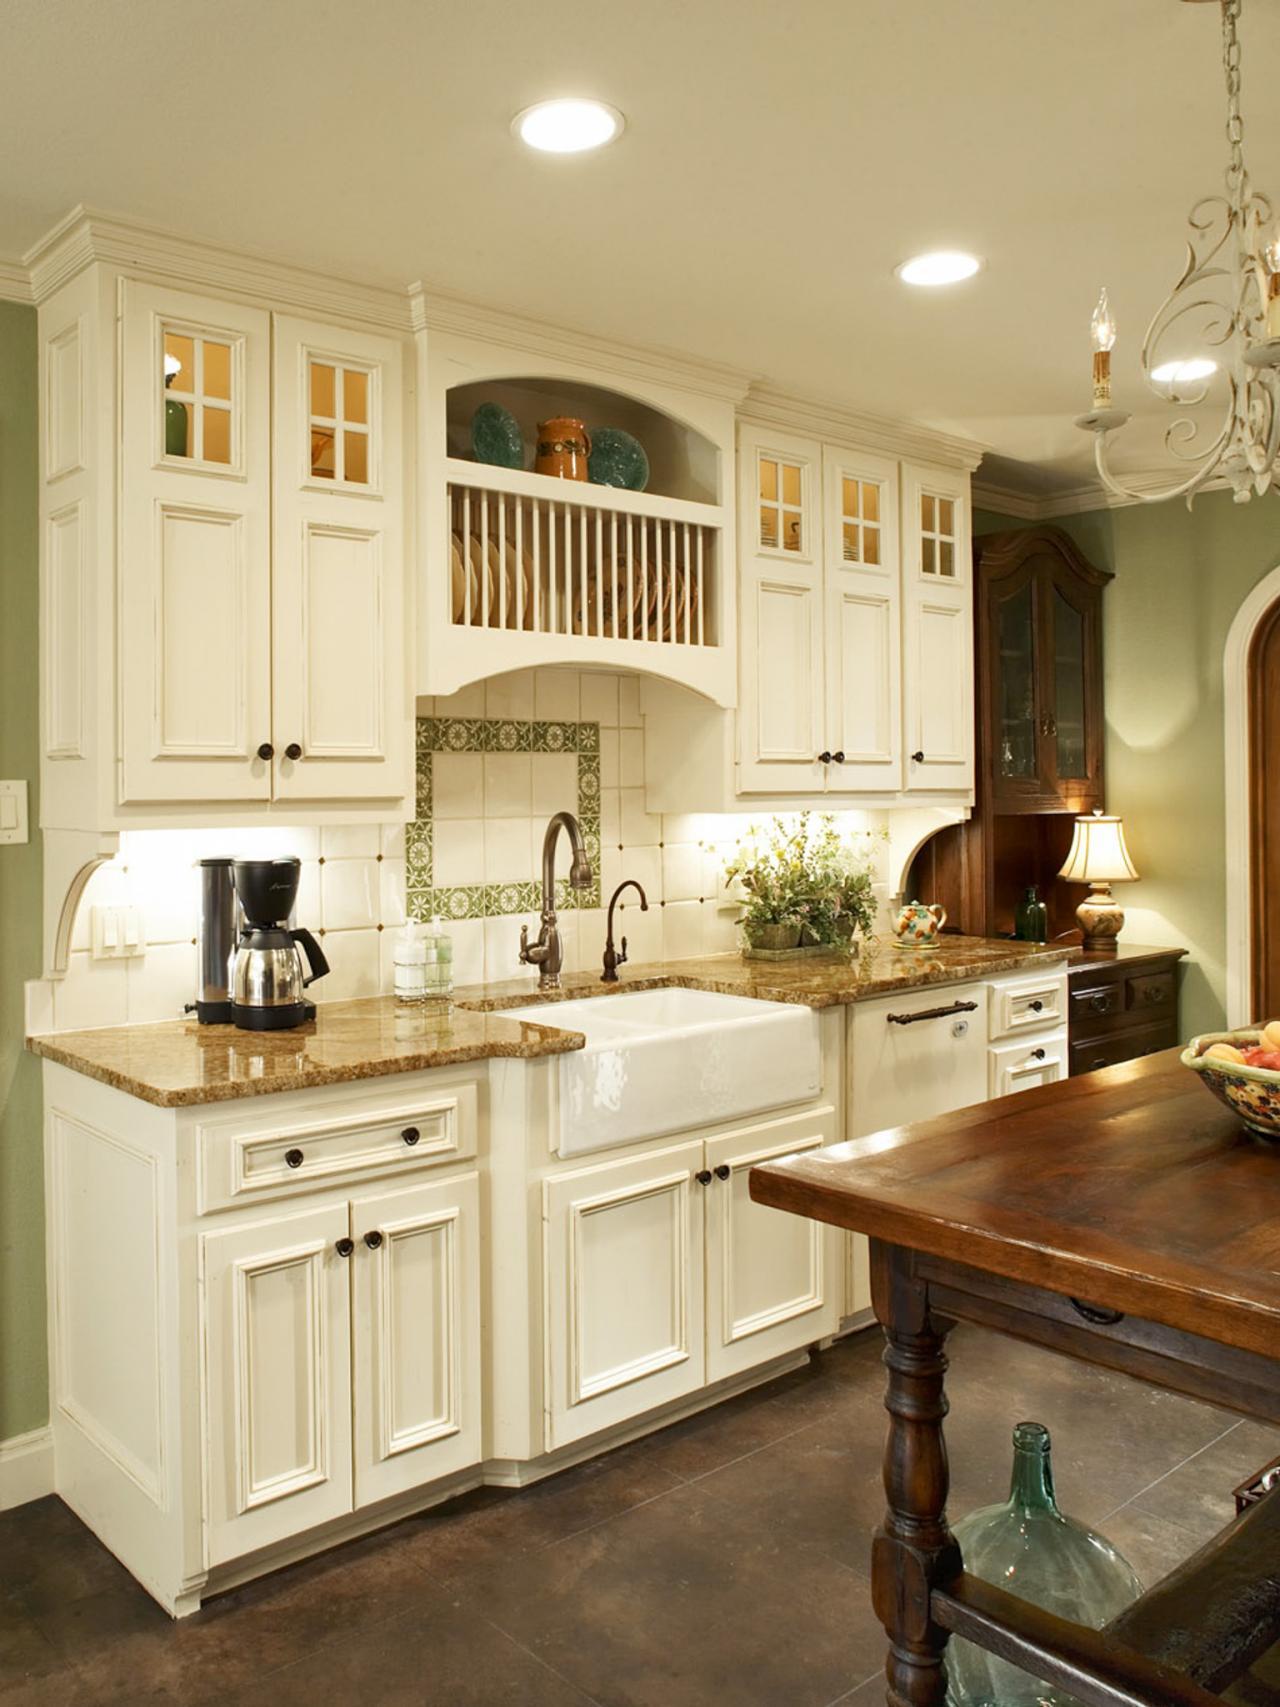 25 Amazing French Kitchen Design Ideas